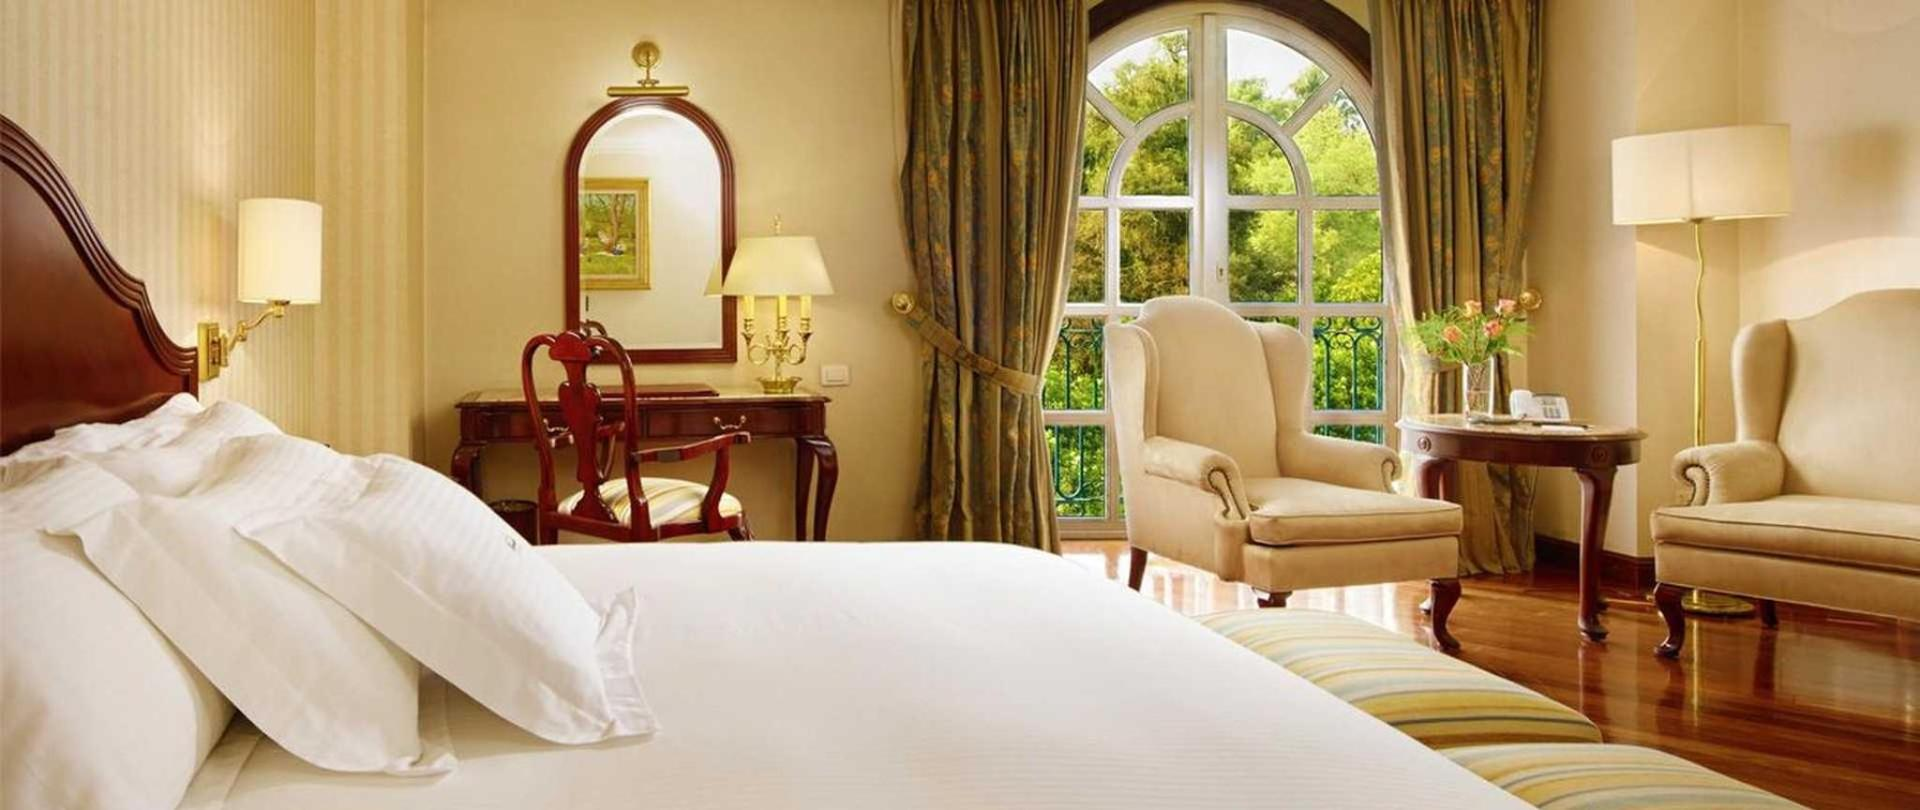 El Green Park Hotel